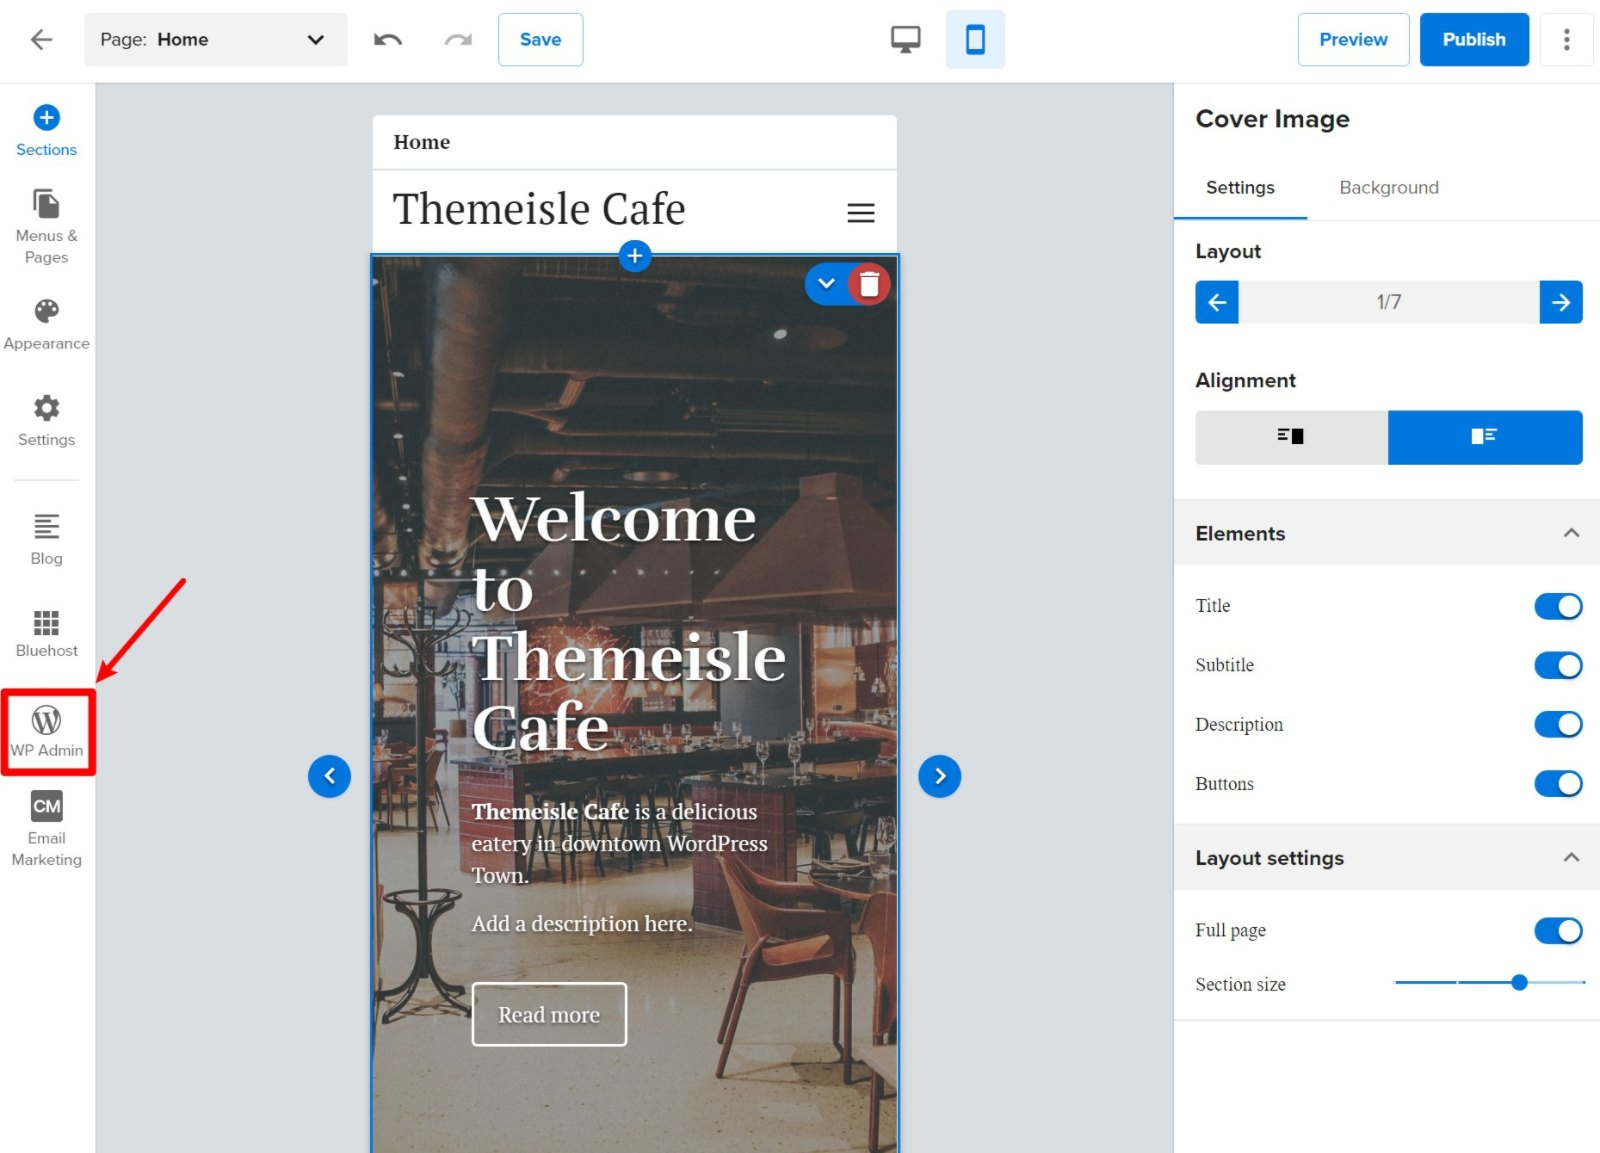 Open WordPress dashboard